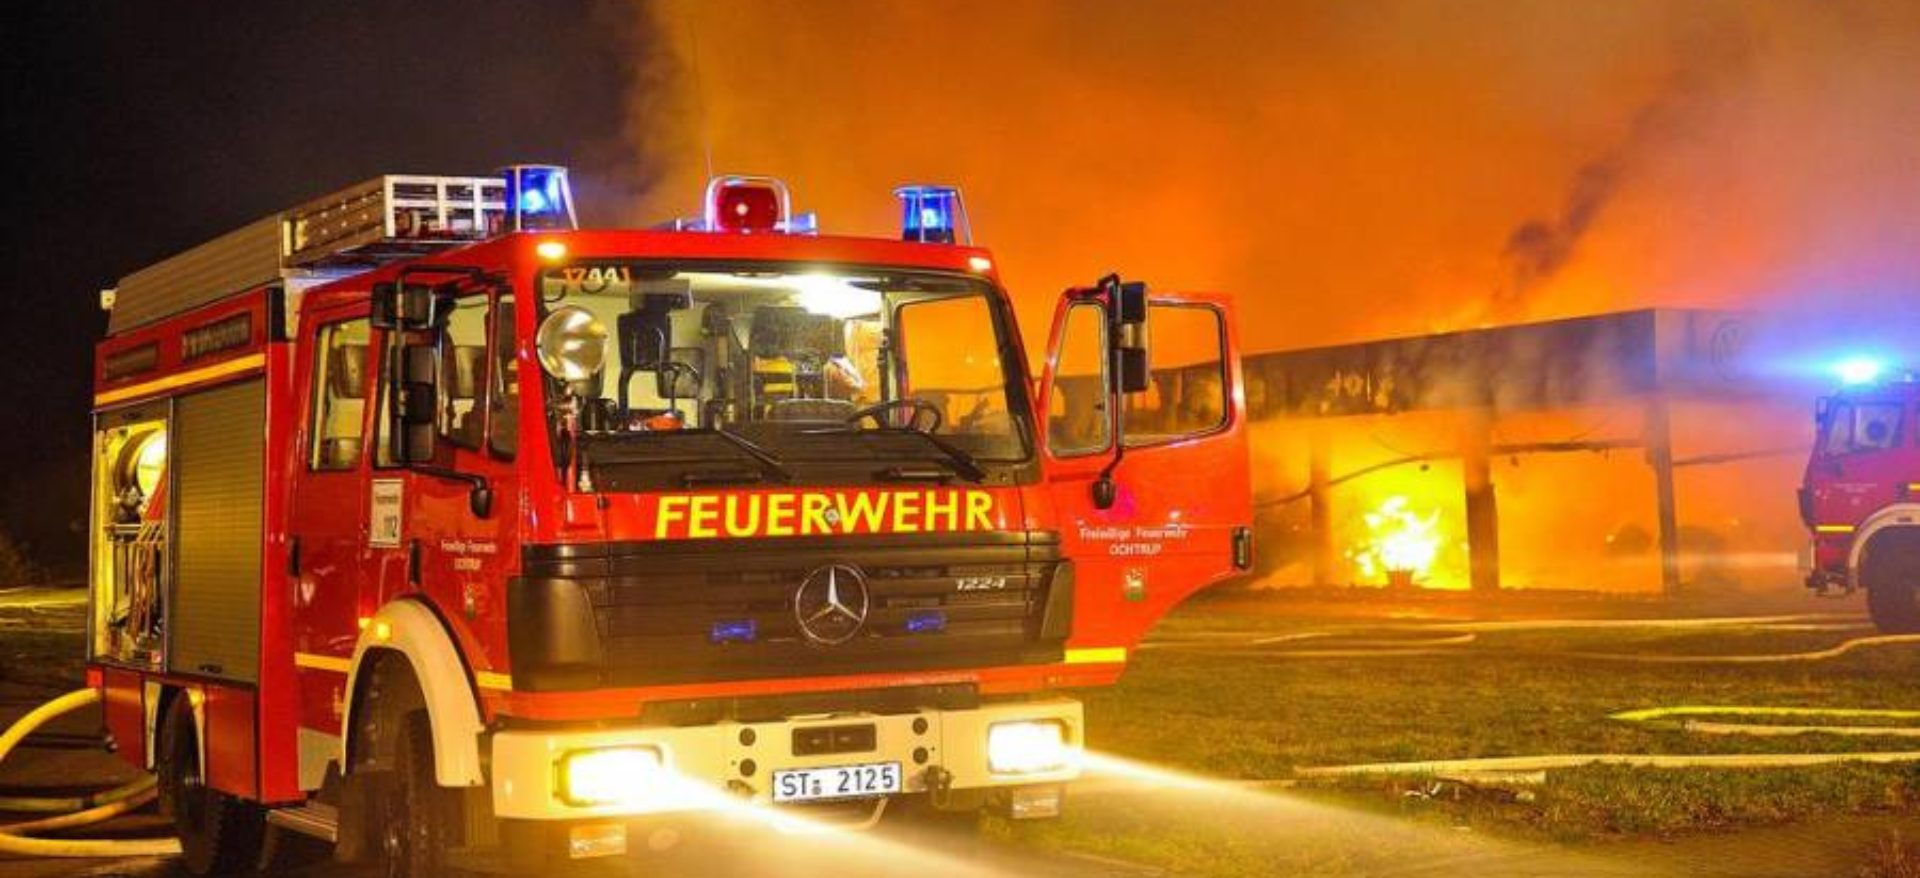 Feuerwehr Ochtrup